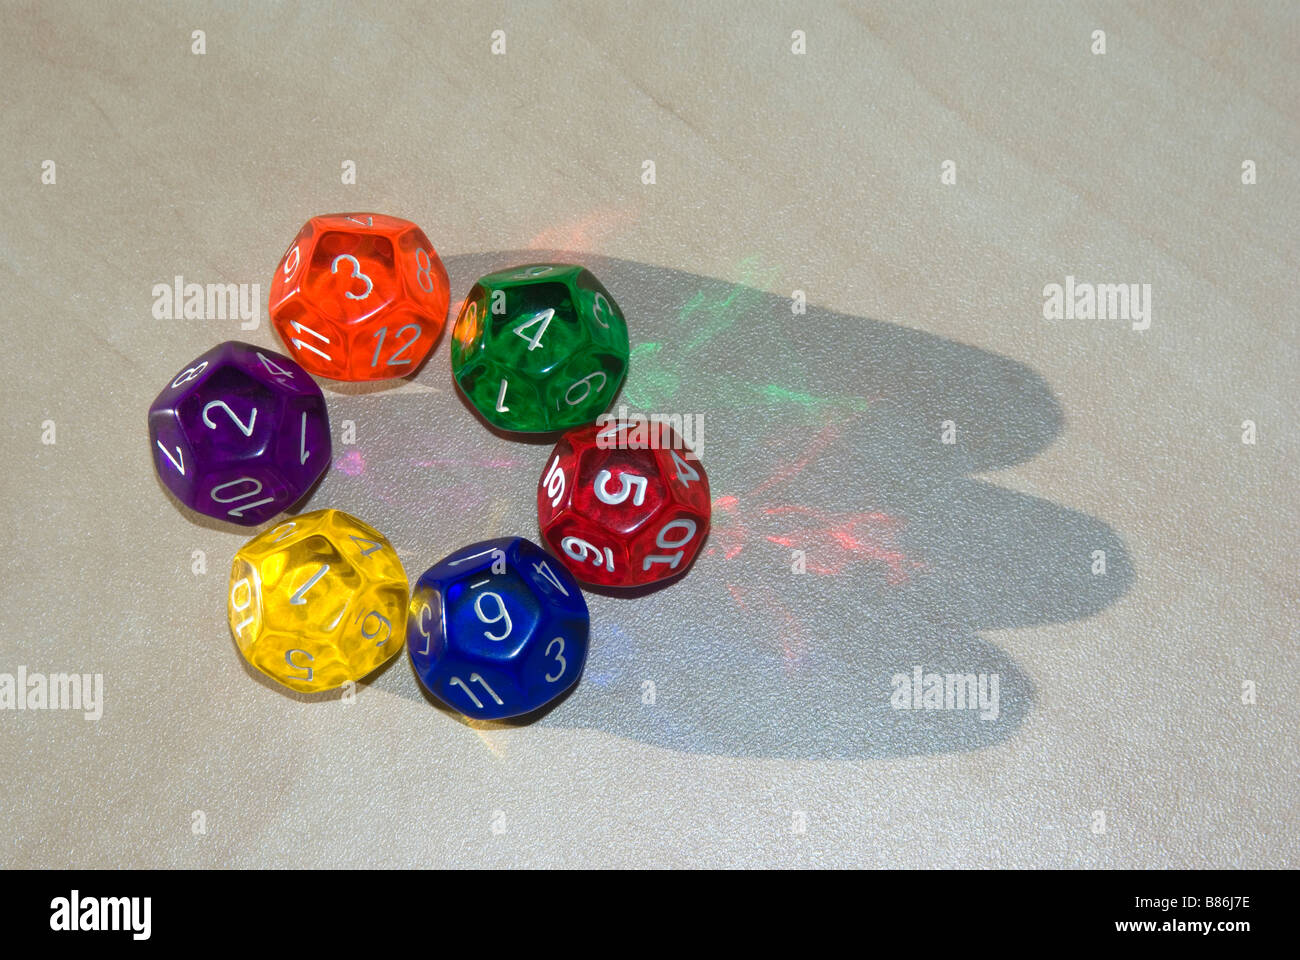 multi colored twelve sided dice - Stock Image